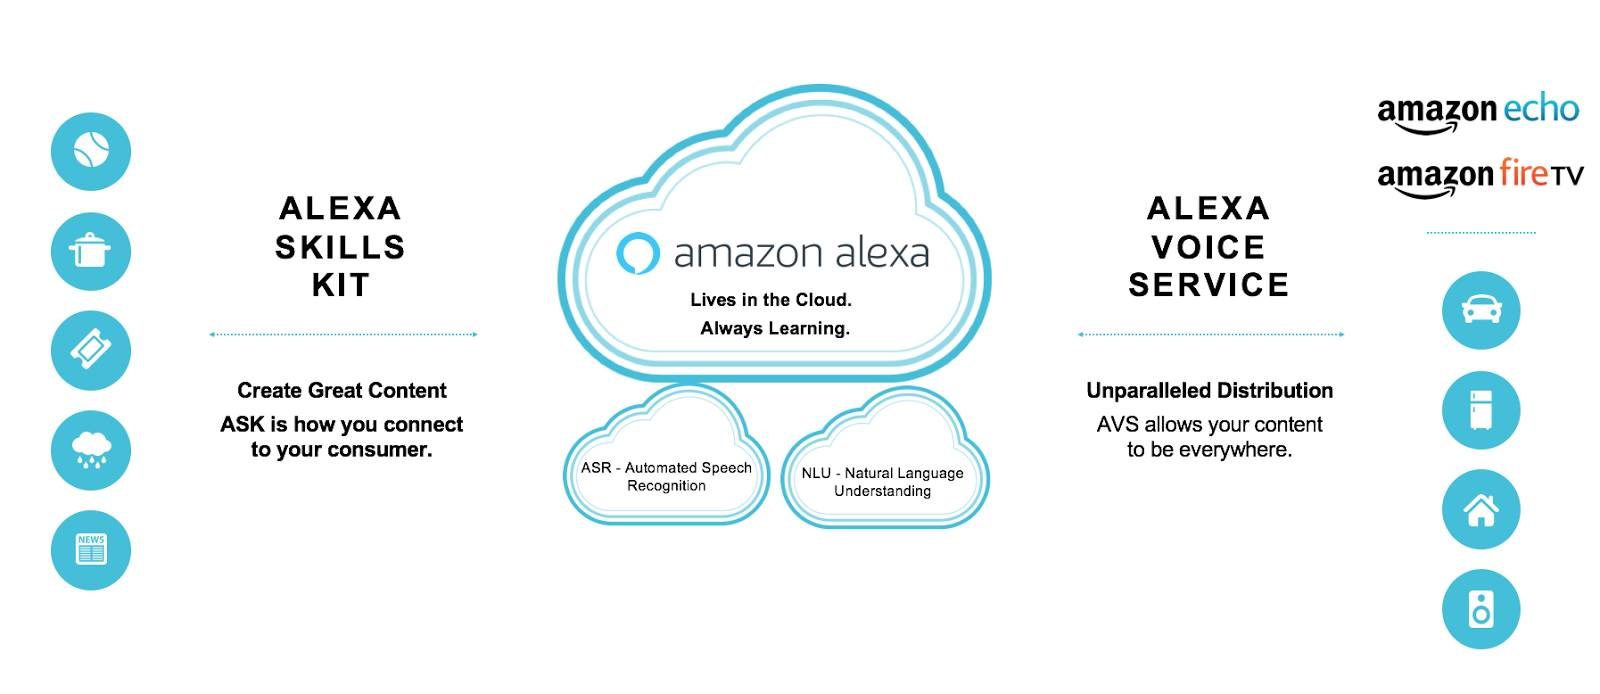 diagram of Alexa skills kit and Alexa voice service